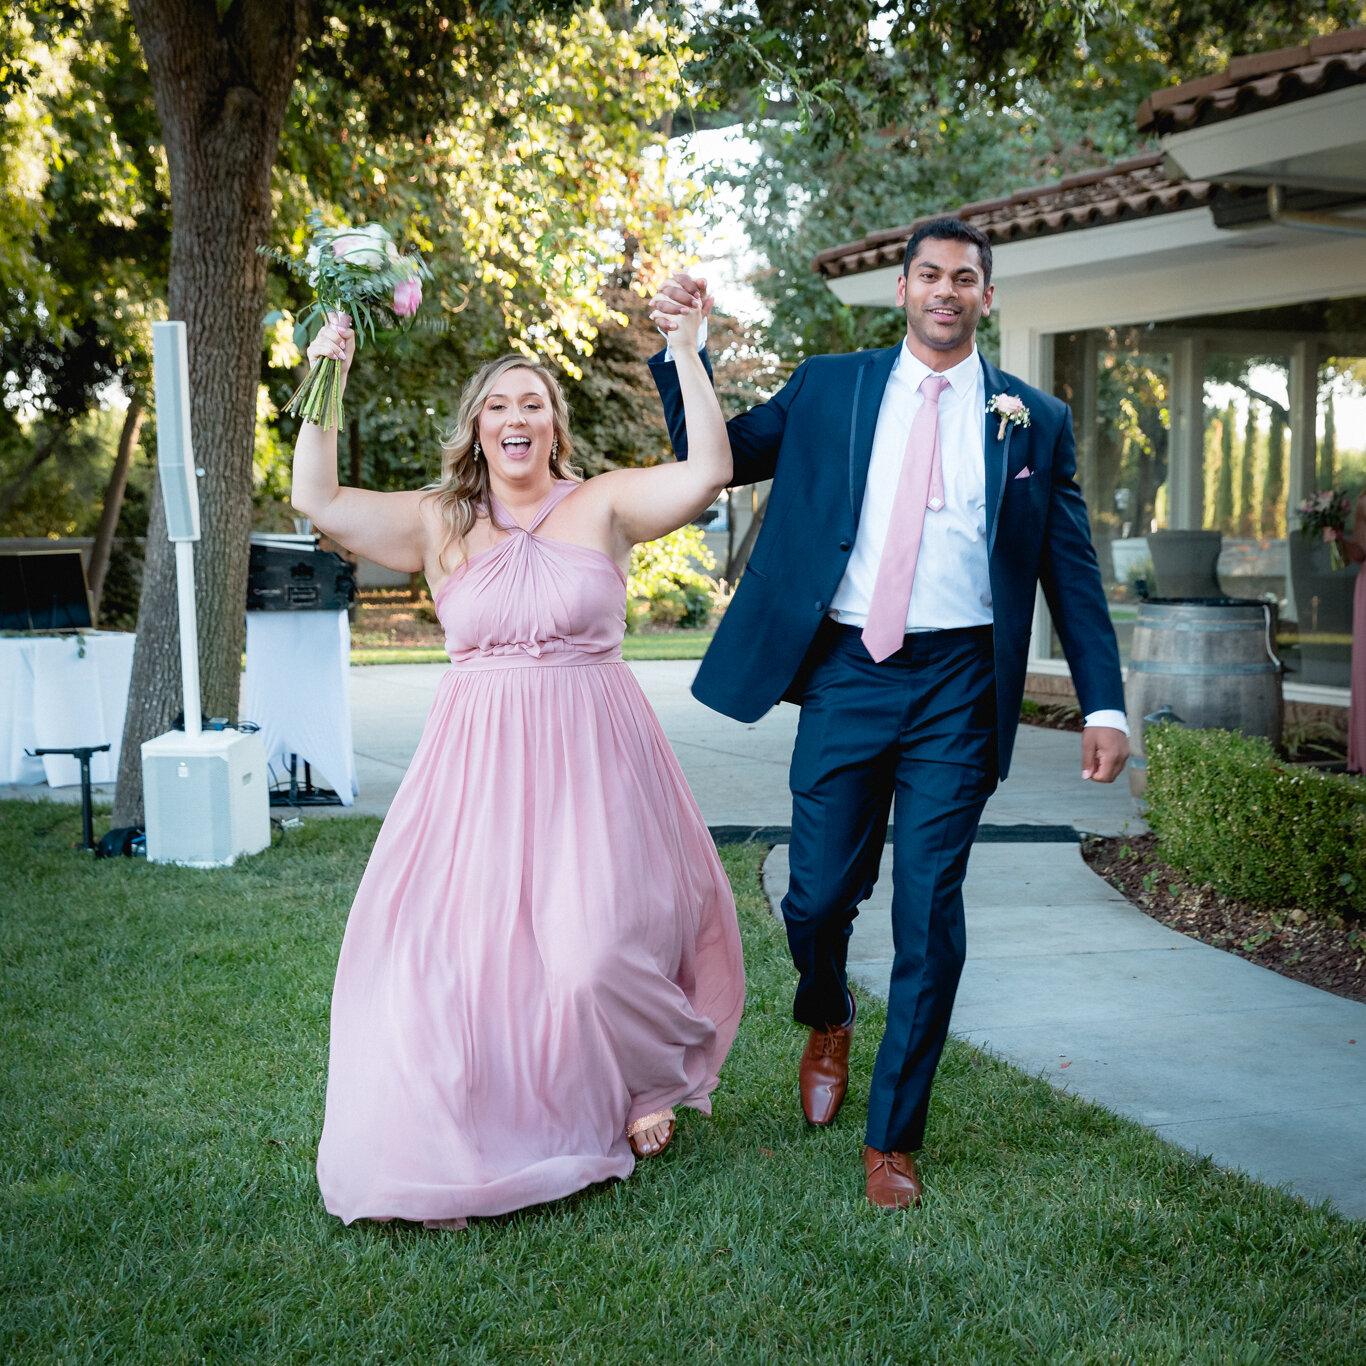 2019.08.24_Emily-Ashir-Wedding-at-the-Maples-6156.jpg